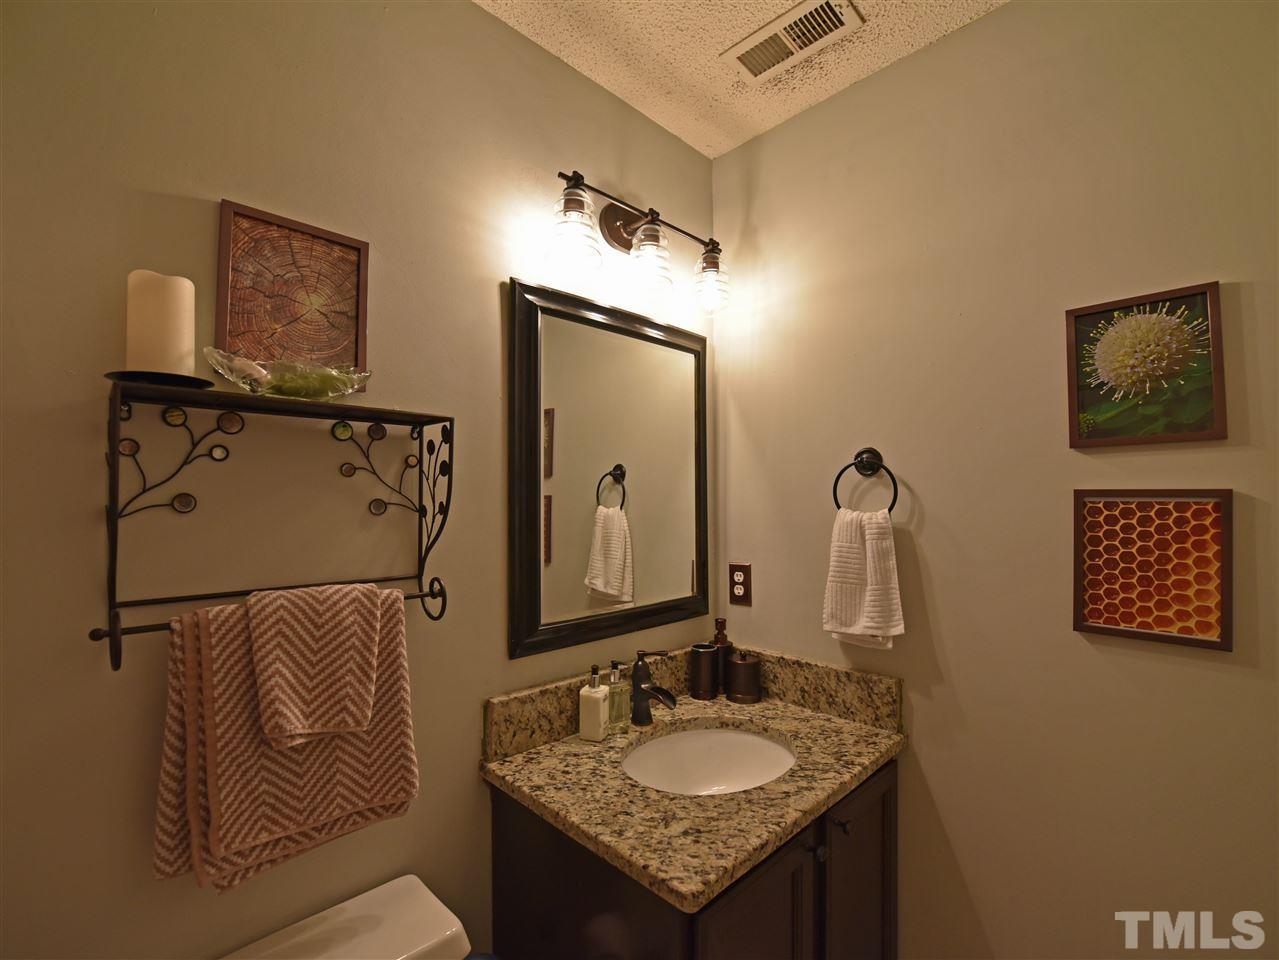 Bathroom Light Fixtures Raleigh Nc 6705 risdon ct, raleigh, nc 27616 mls# 2097175 - movoto